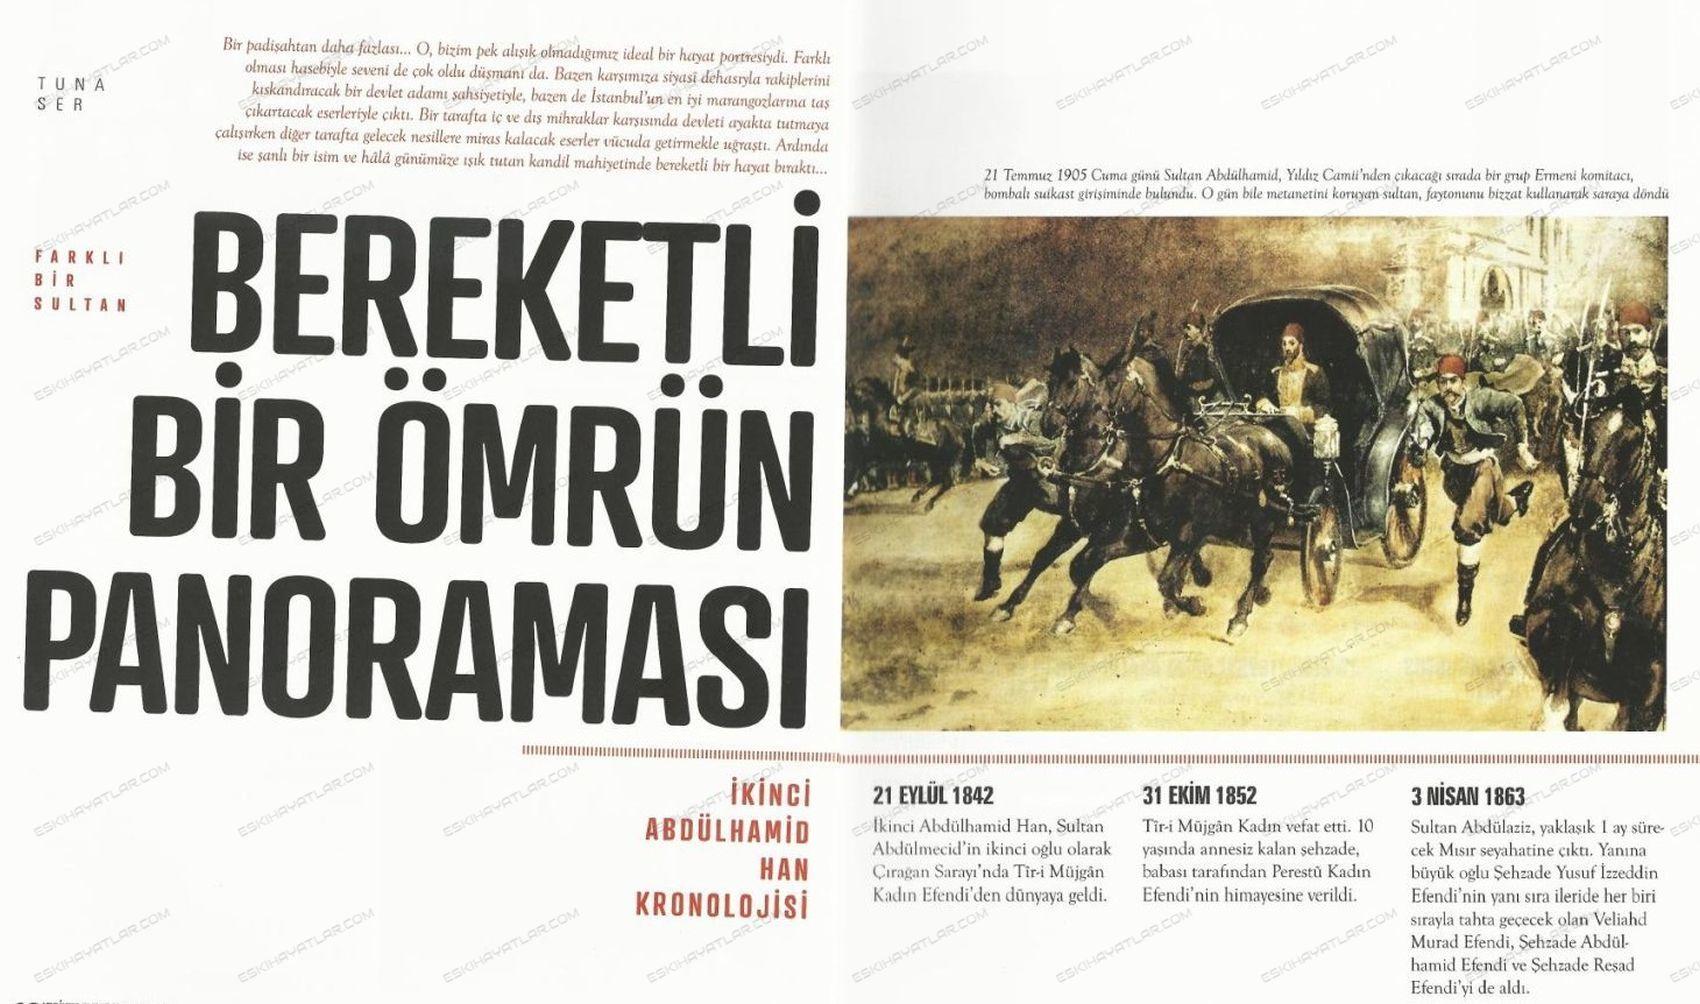 0369-sultan-abdulhamid-vefatinin-100-yili-yedi-kita-dergisi-abdulhamid-belgeseli (6)